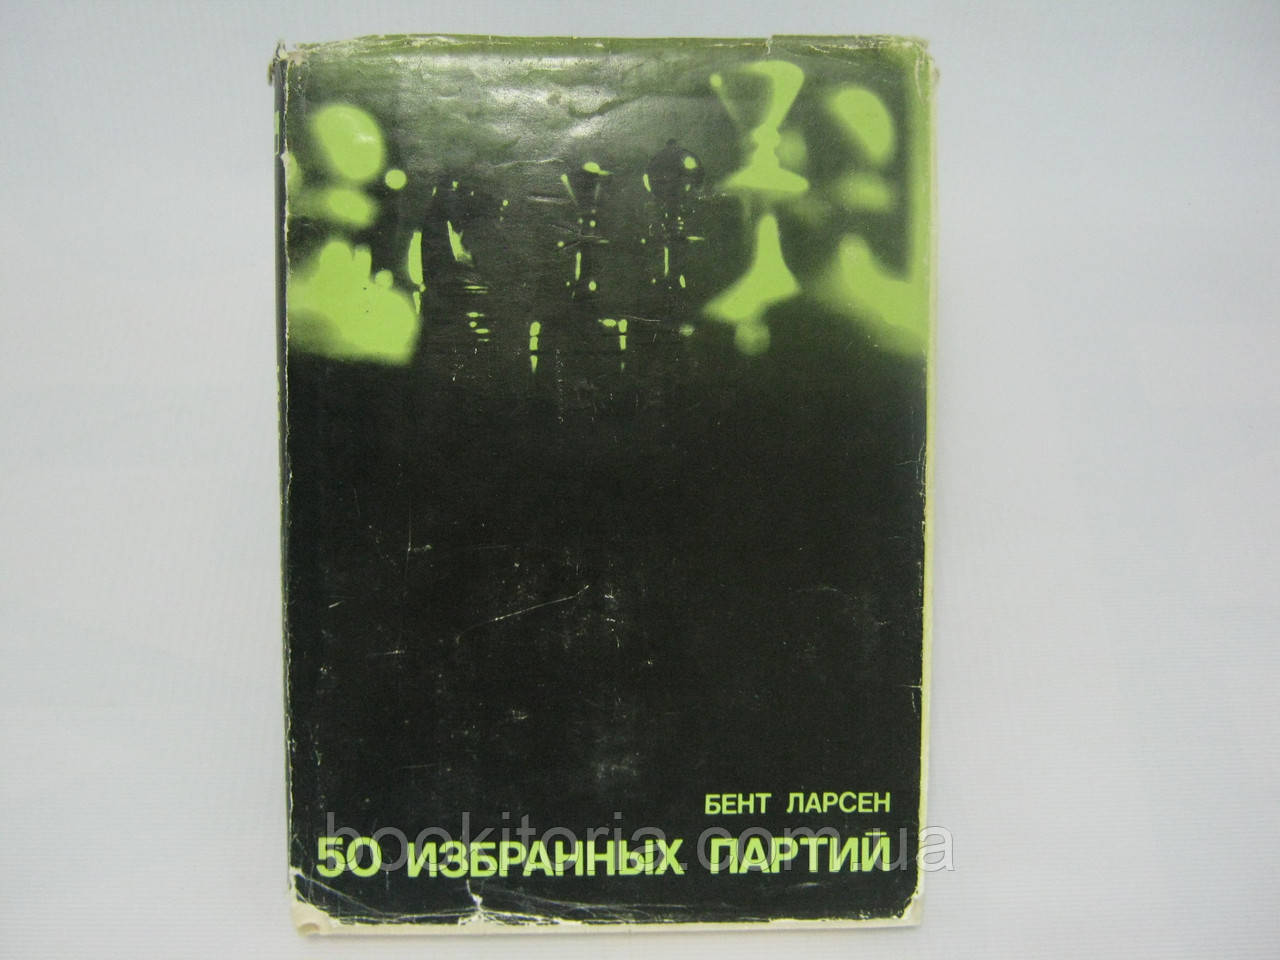 Ларсен Б. 50 избранных партий (1948-1969) (б/у).